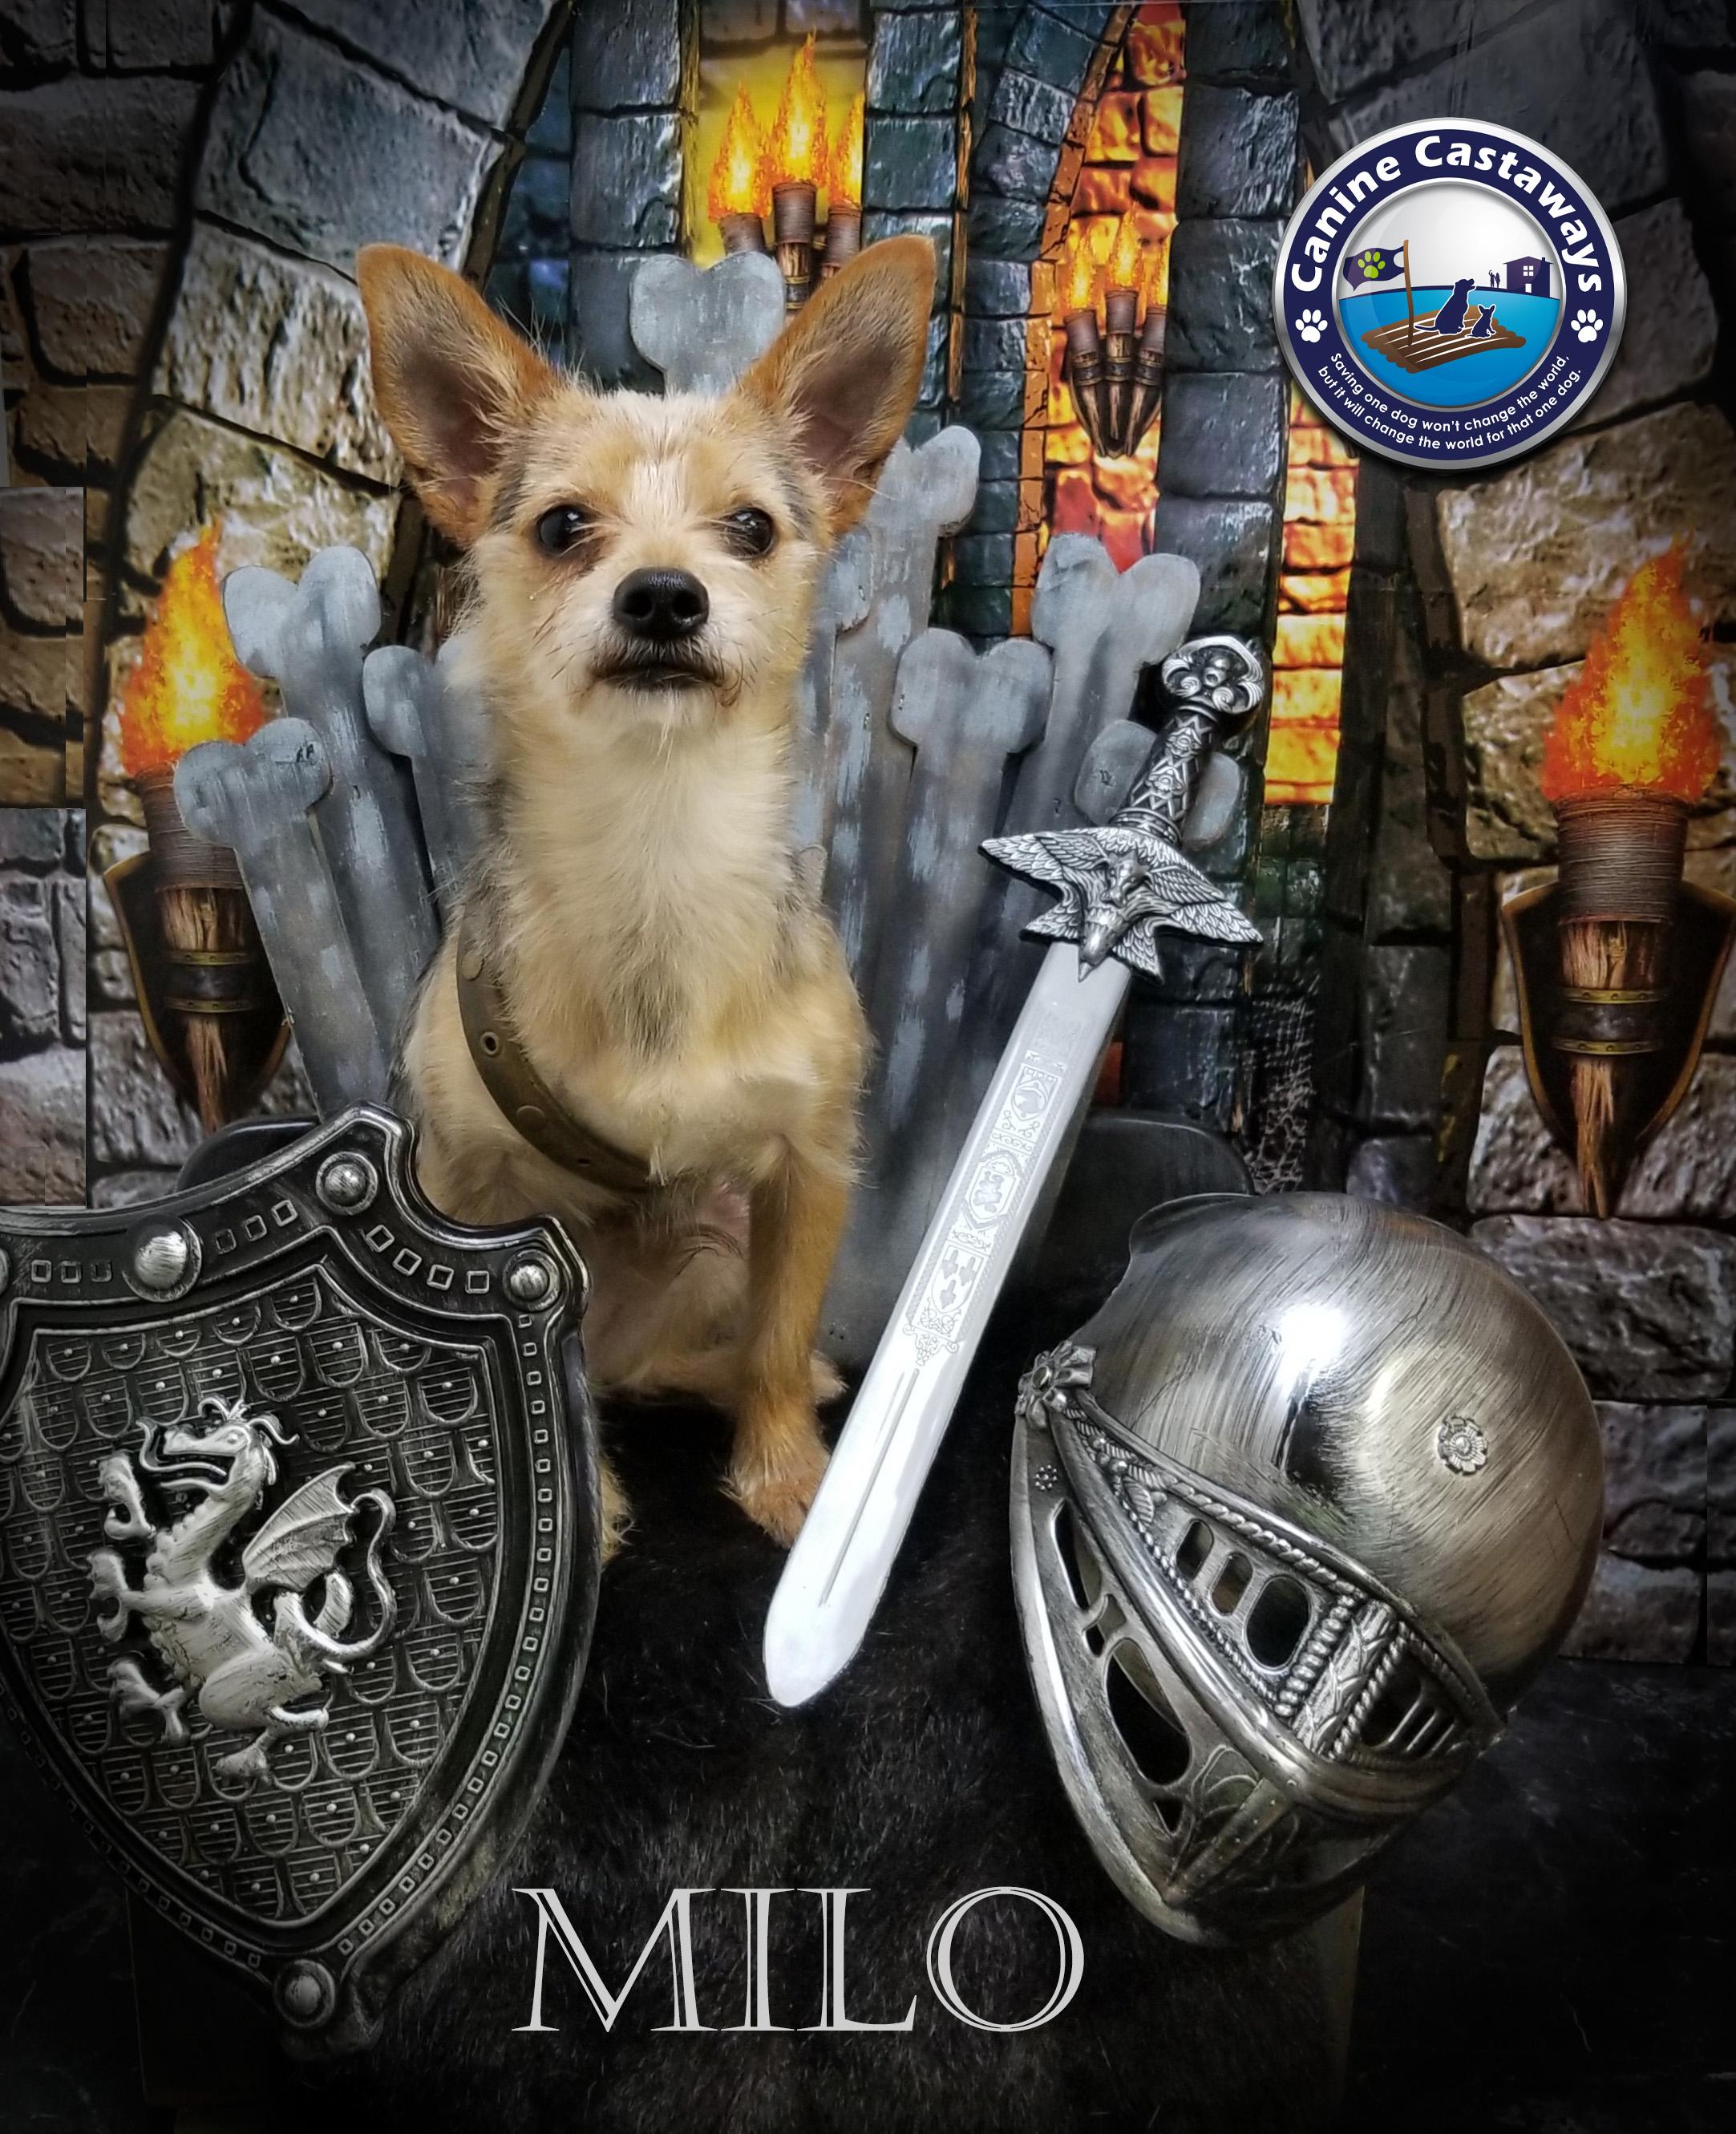 Milo 0518 throne